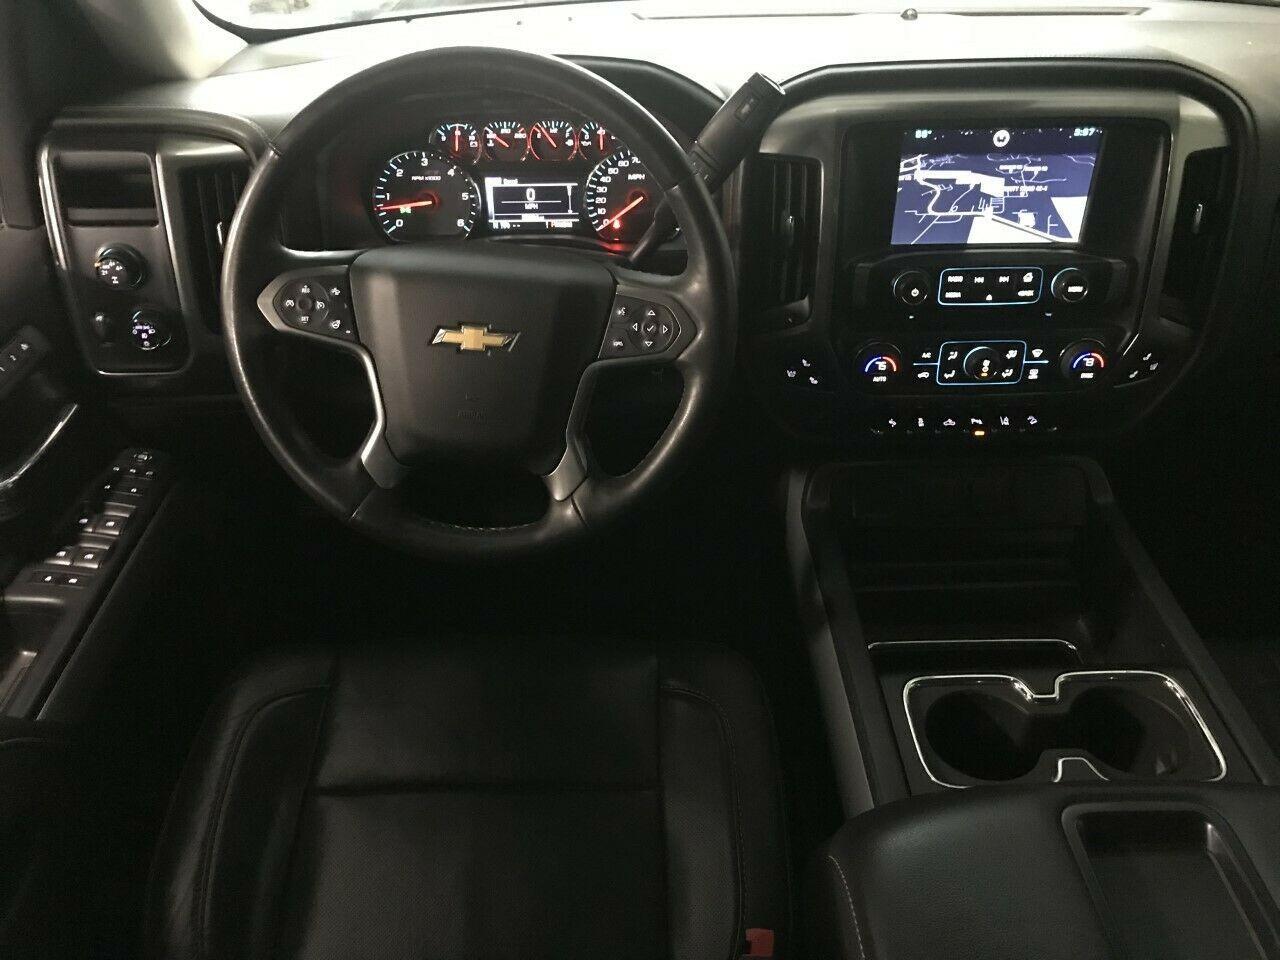 low miles 2015 Chevrolet Silverado 1500 Z71 Midnight EDITION lifted